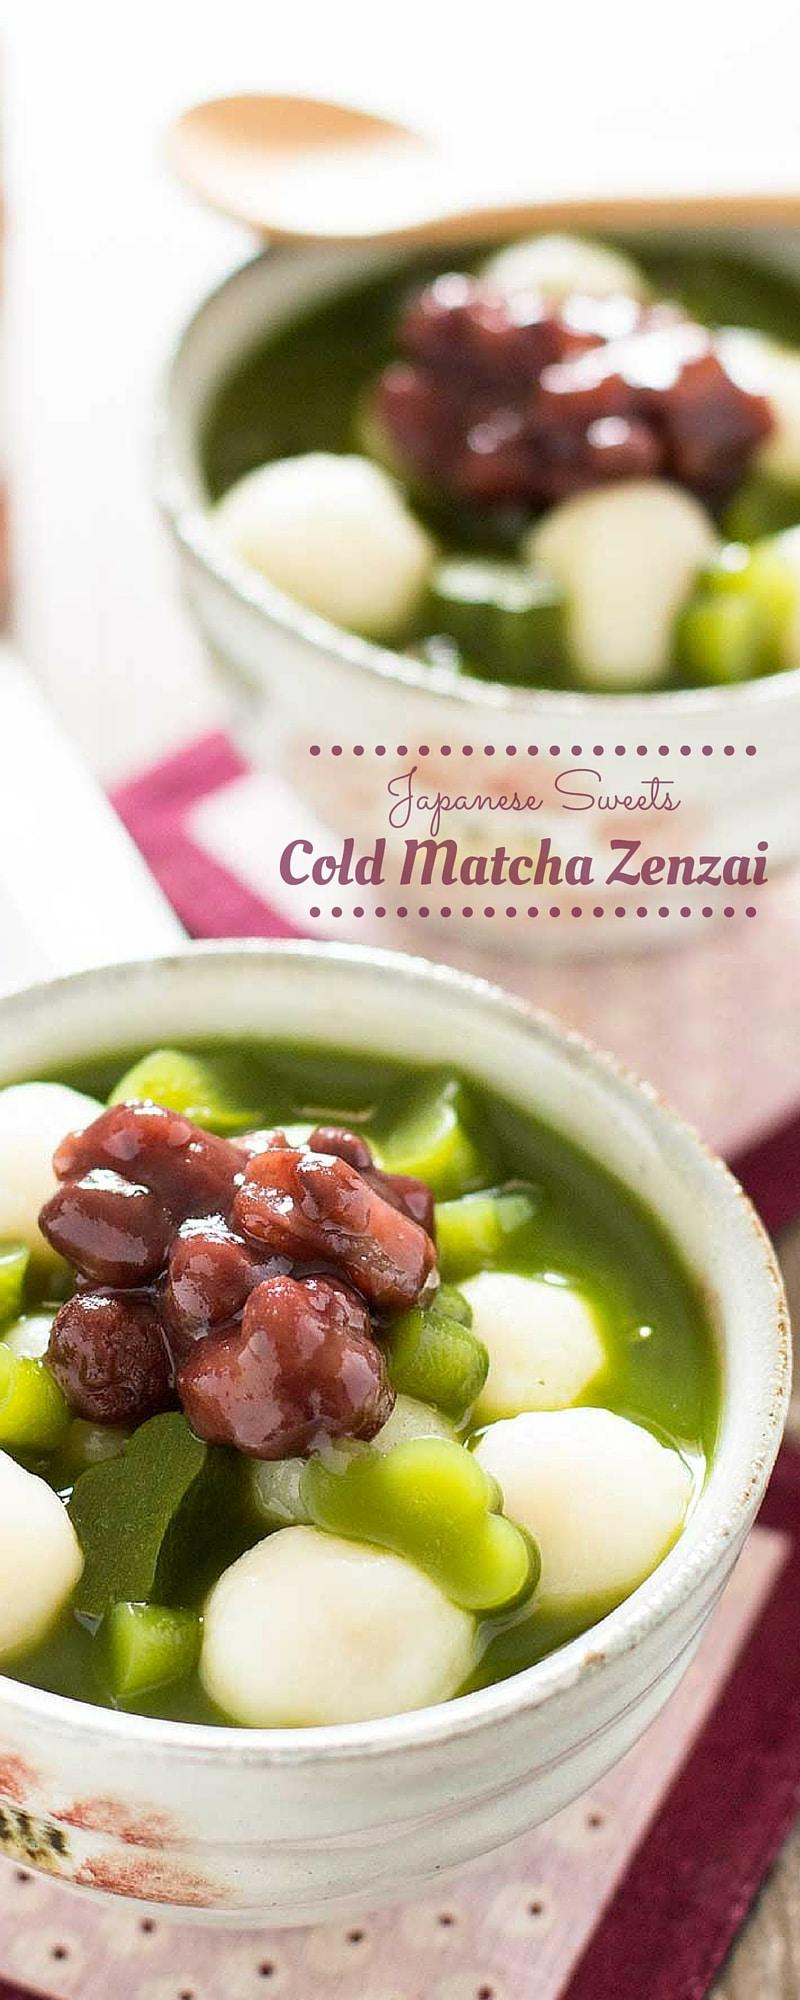 Cold Matcha Zenzai